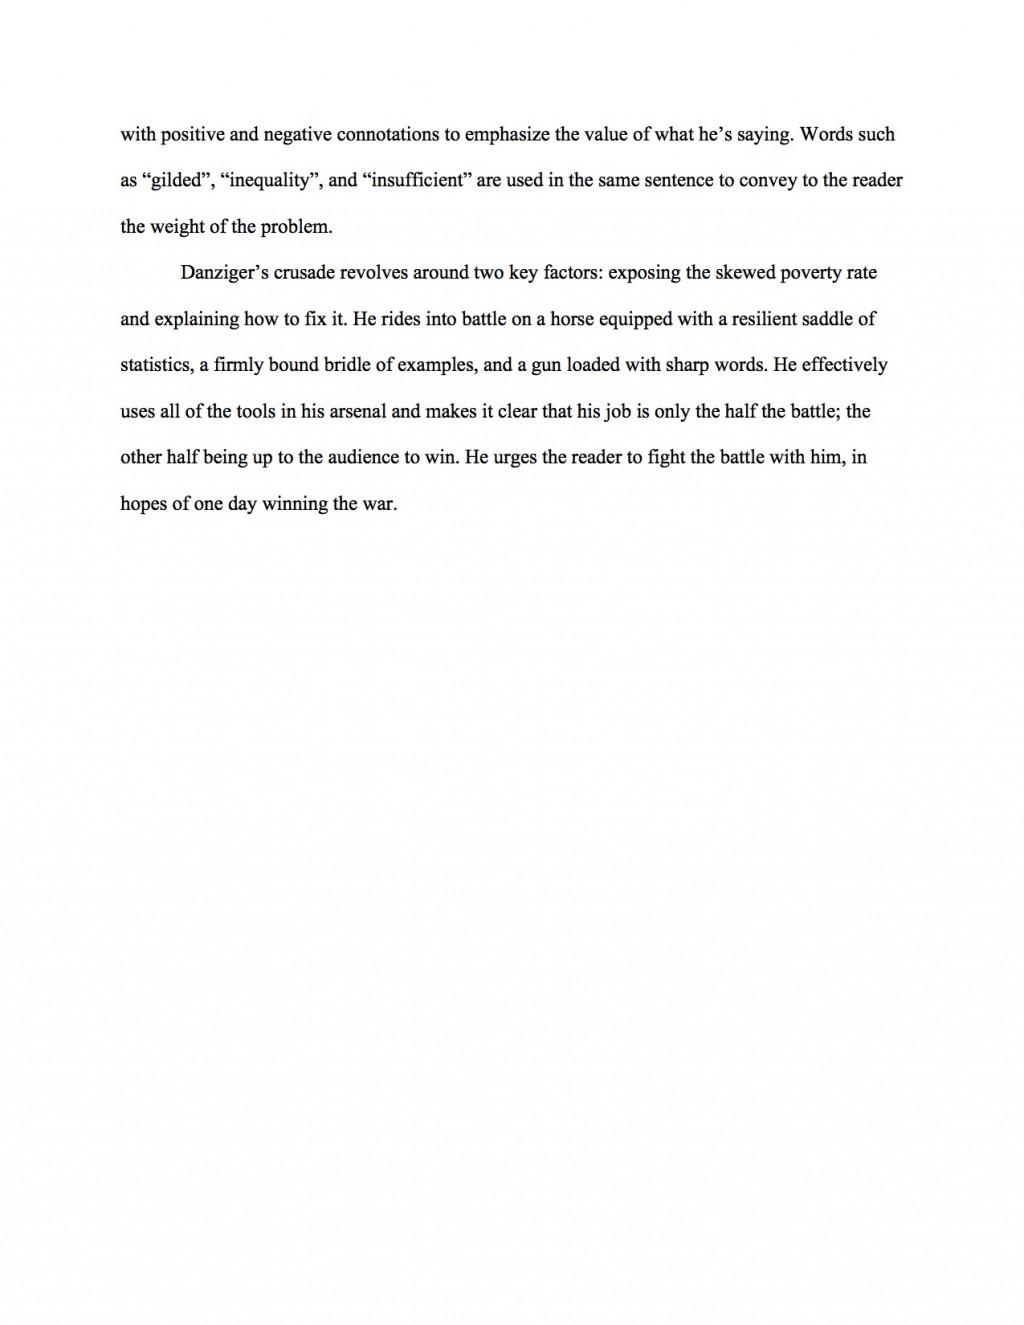 003 Op Essay Example Page Wonderful Ed Paper Examples Op-ed Sample Large